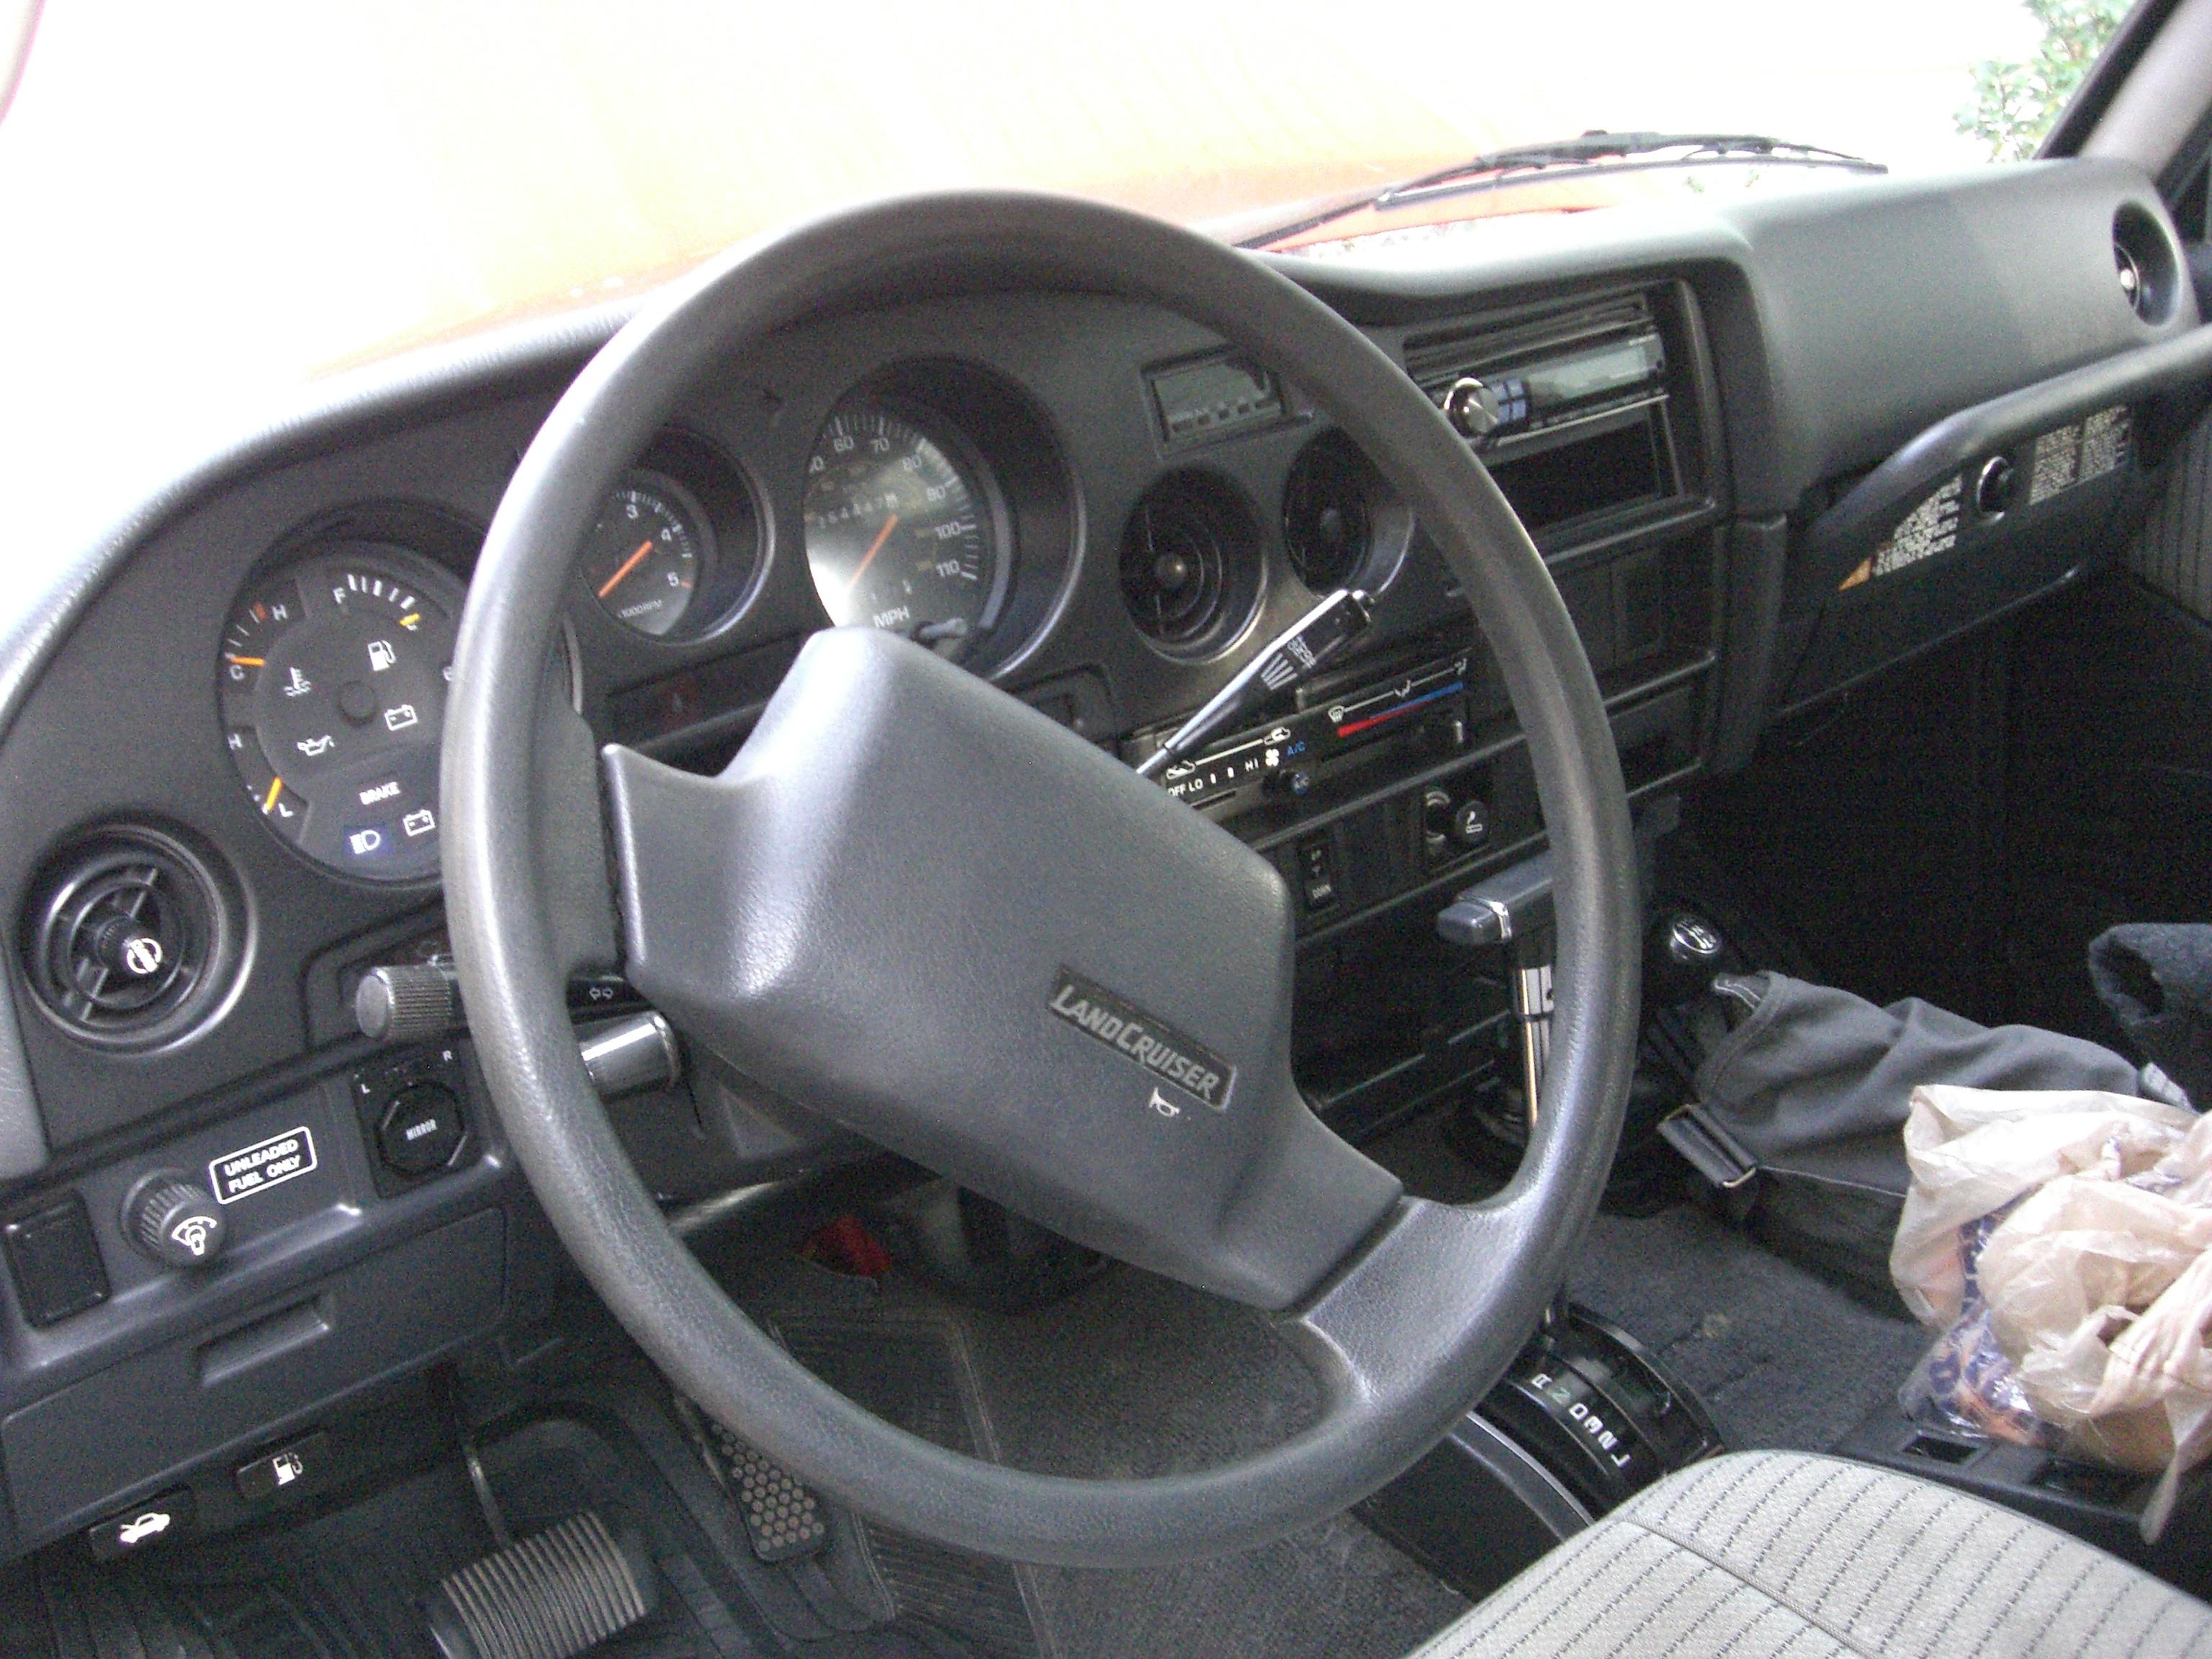 1989 Toyota Fj60 Land Cruiser Kevs New Daily Driver Nick Despite